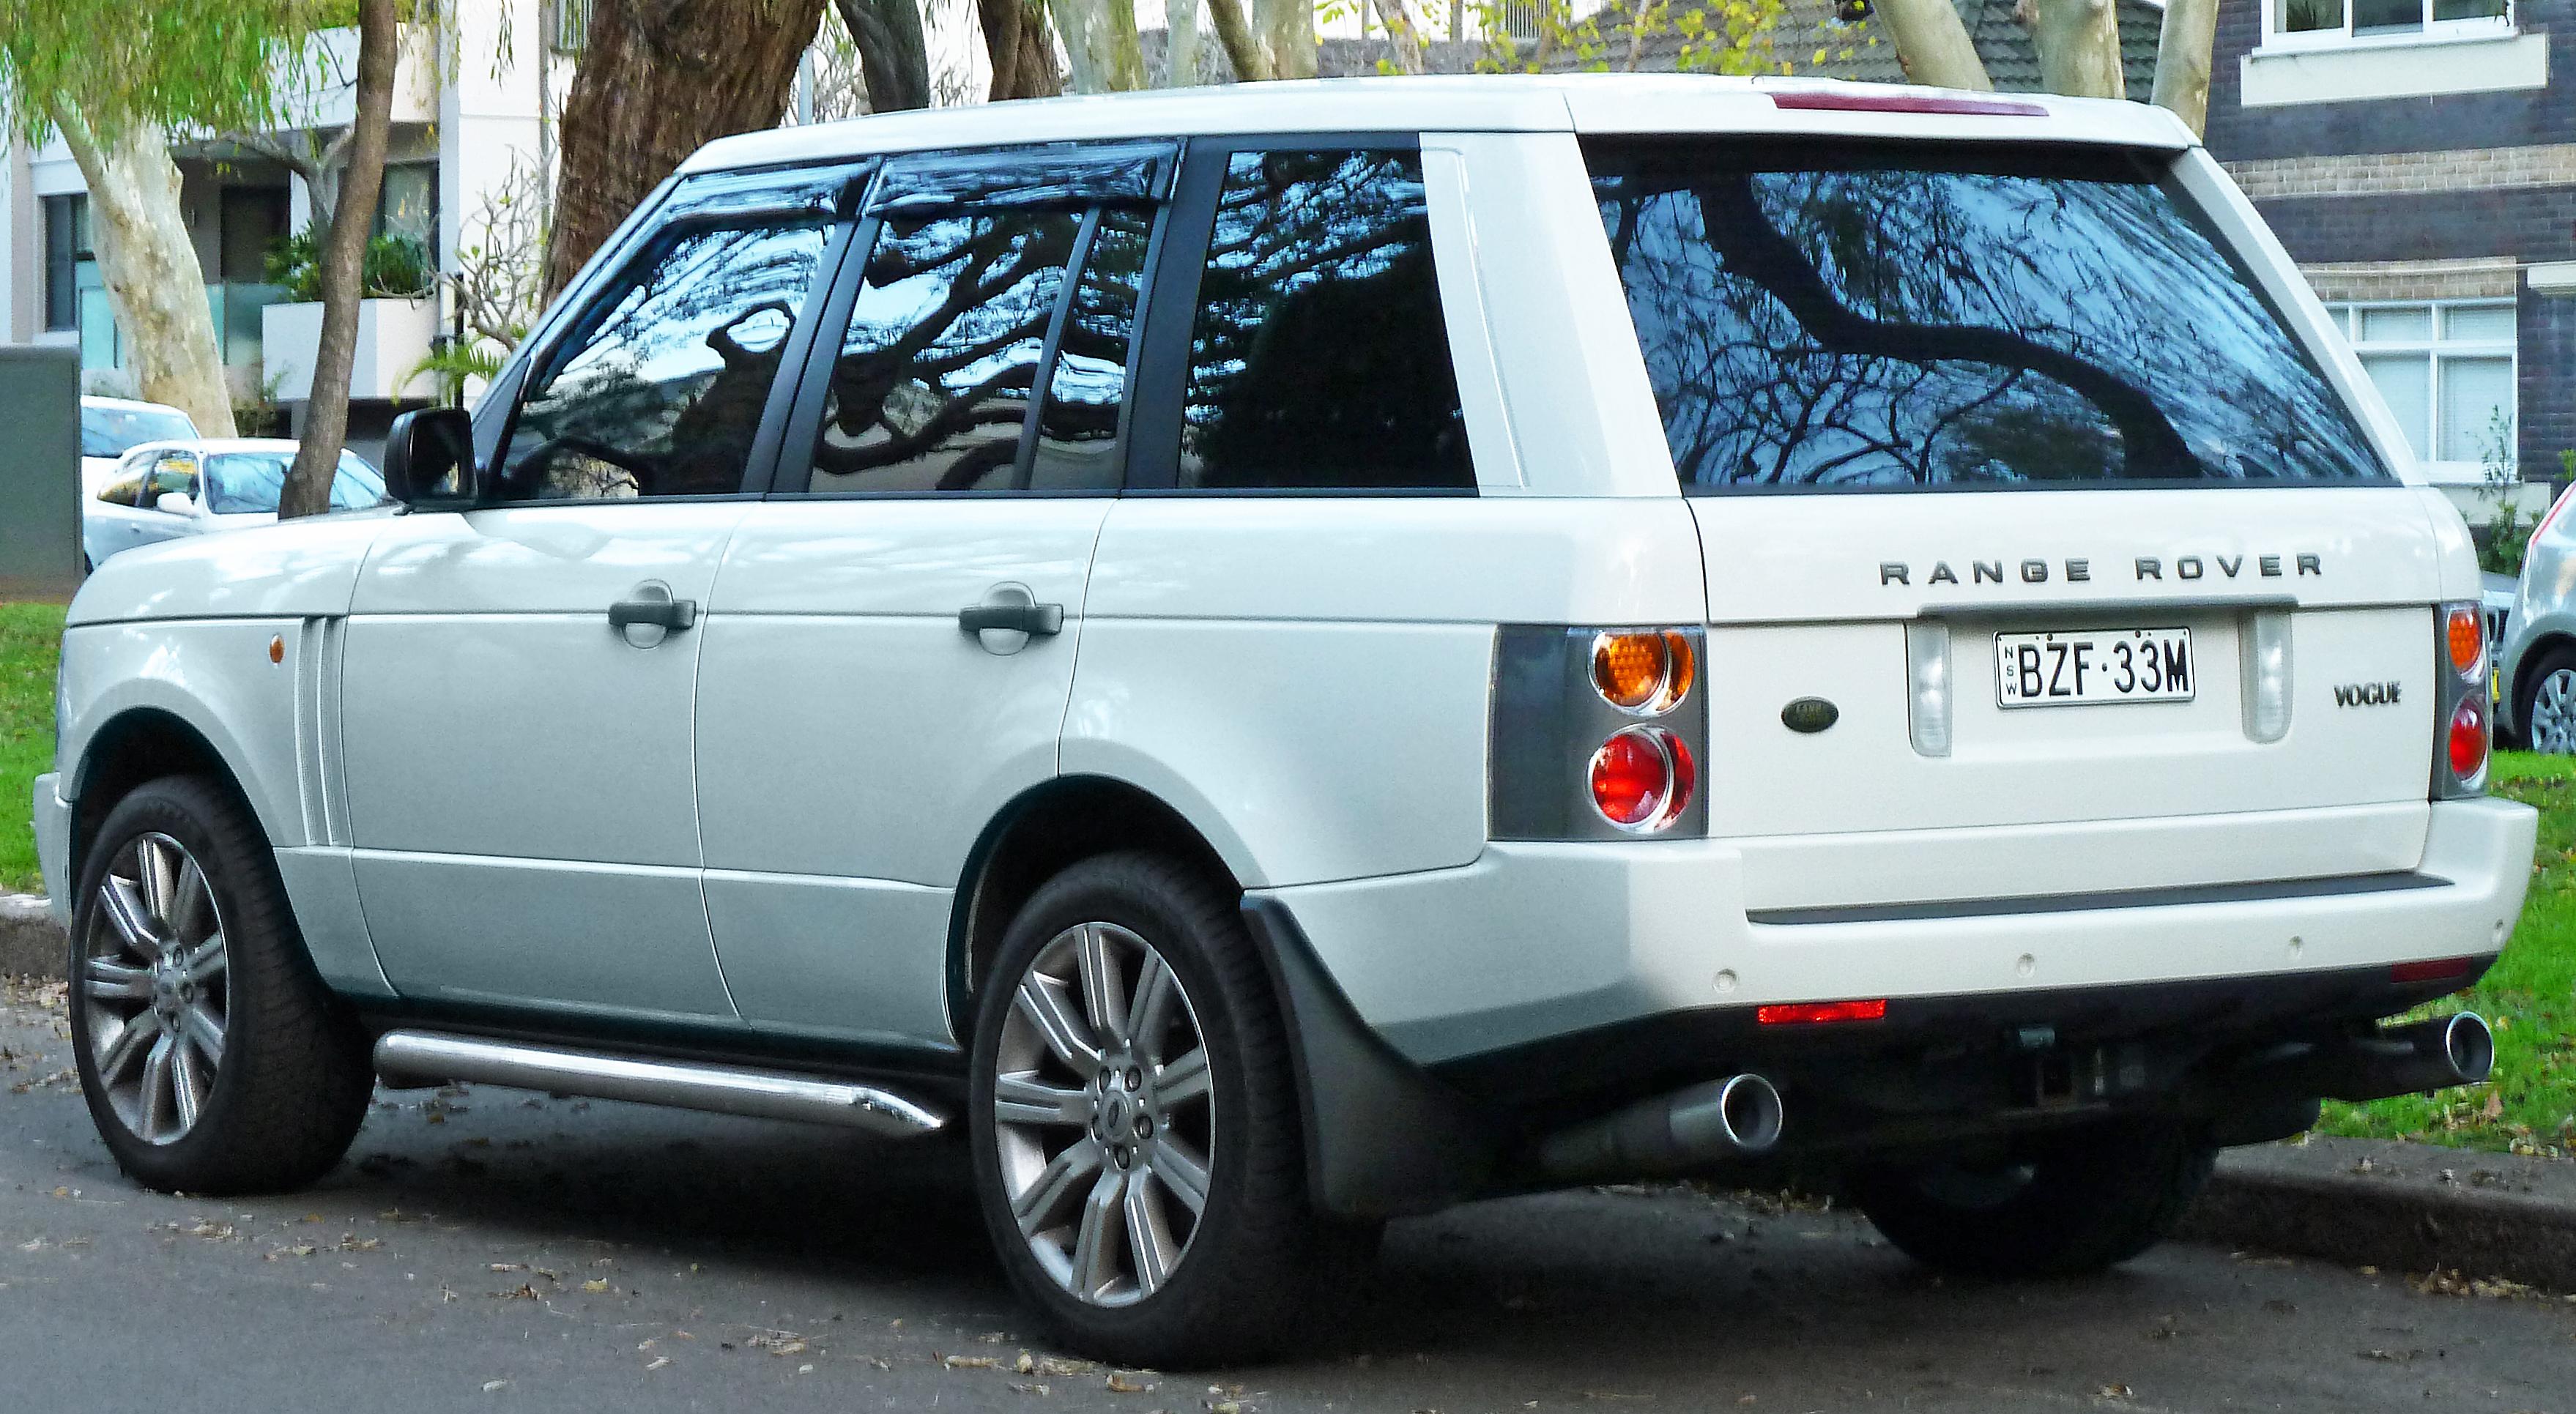 https://upload.wikimedia.org/wikipedia/commons/8/8e/2003_Land_Rover_Range_Rover_%28L322_03MY%29_Vogue_wagon_%282012-06-04%29_02.jpg